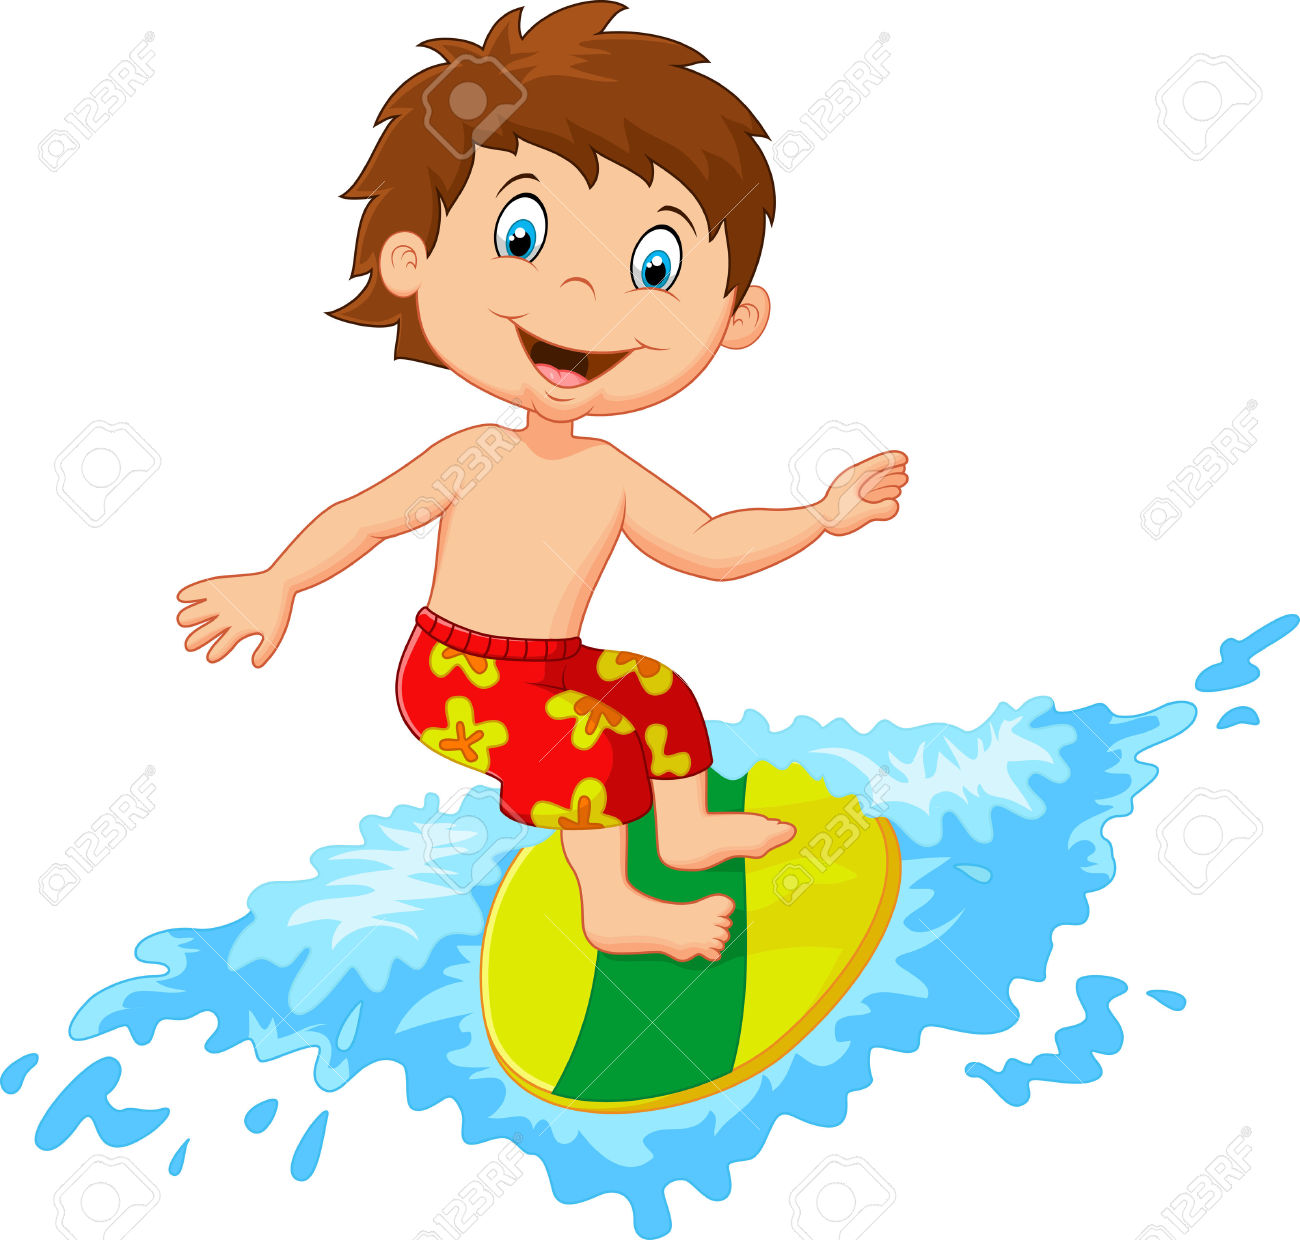 1300x1240 Kids On Surfboard Clipart